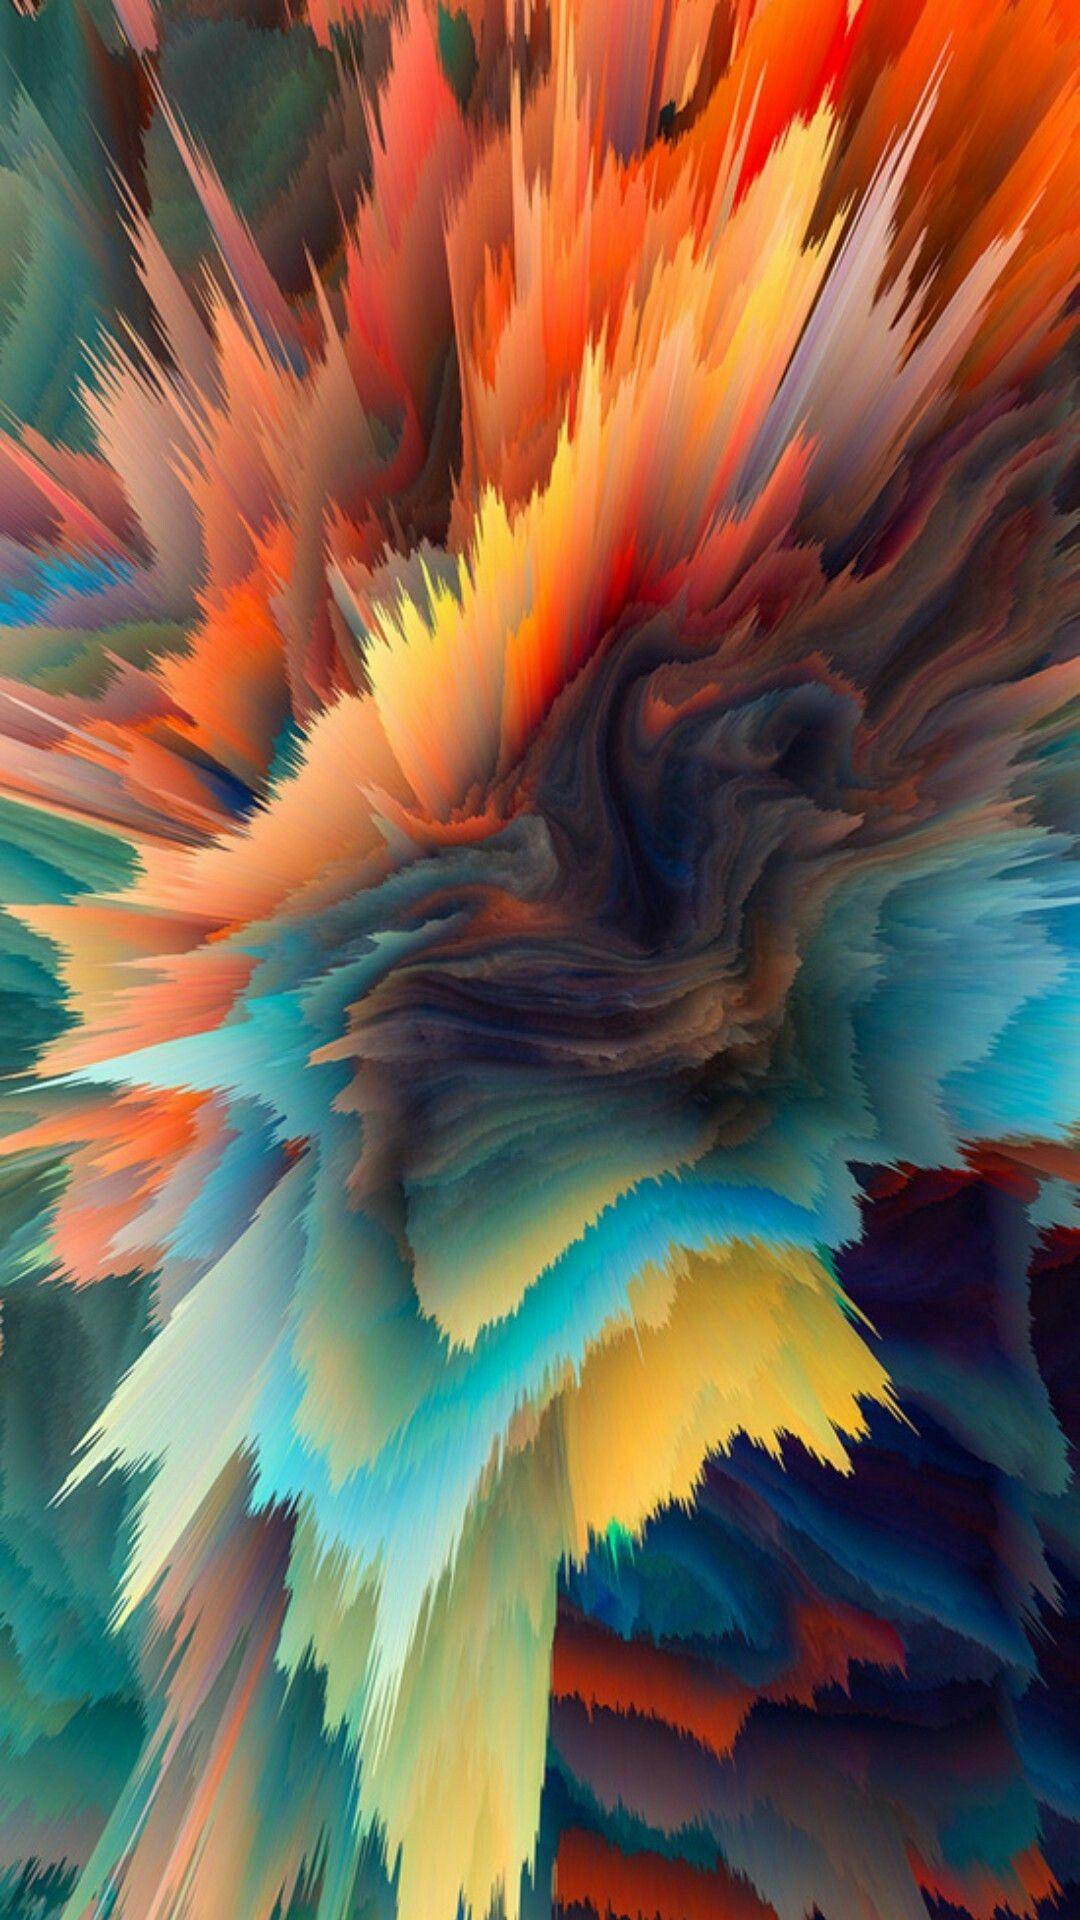 Colourful Wallpaper Color Paint Exposion Wallpaper Fluid